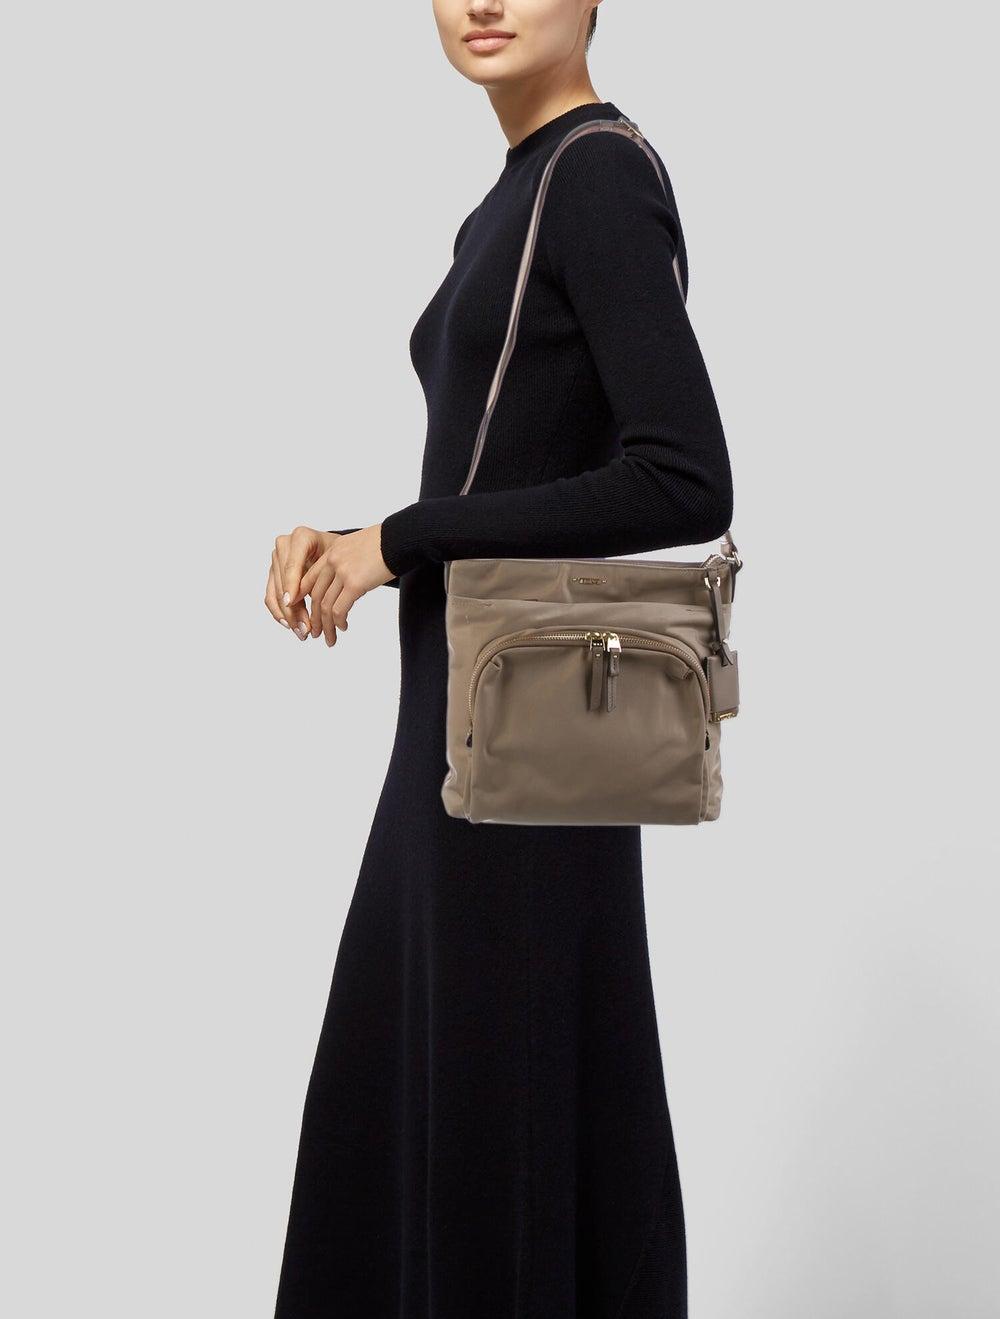 Tumi Nylon SHoulder Bag Gold - image 2